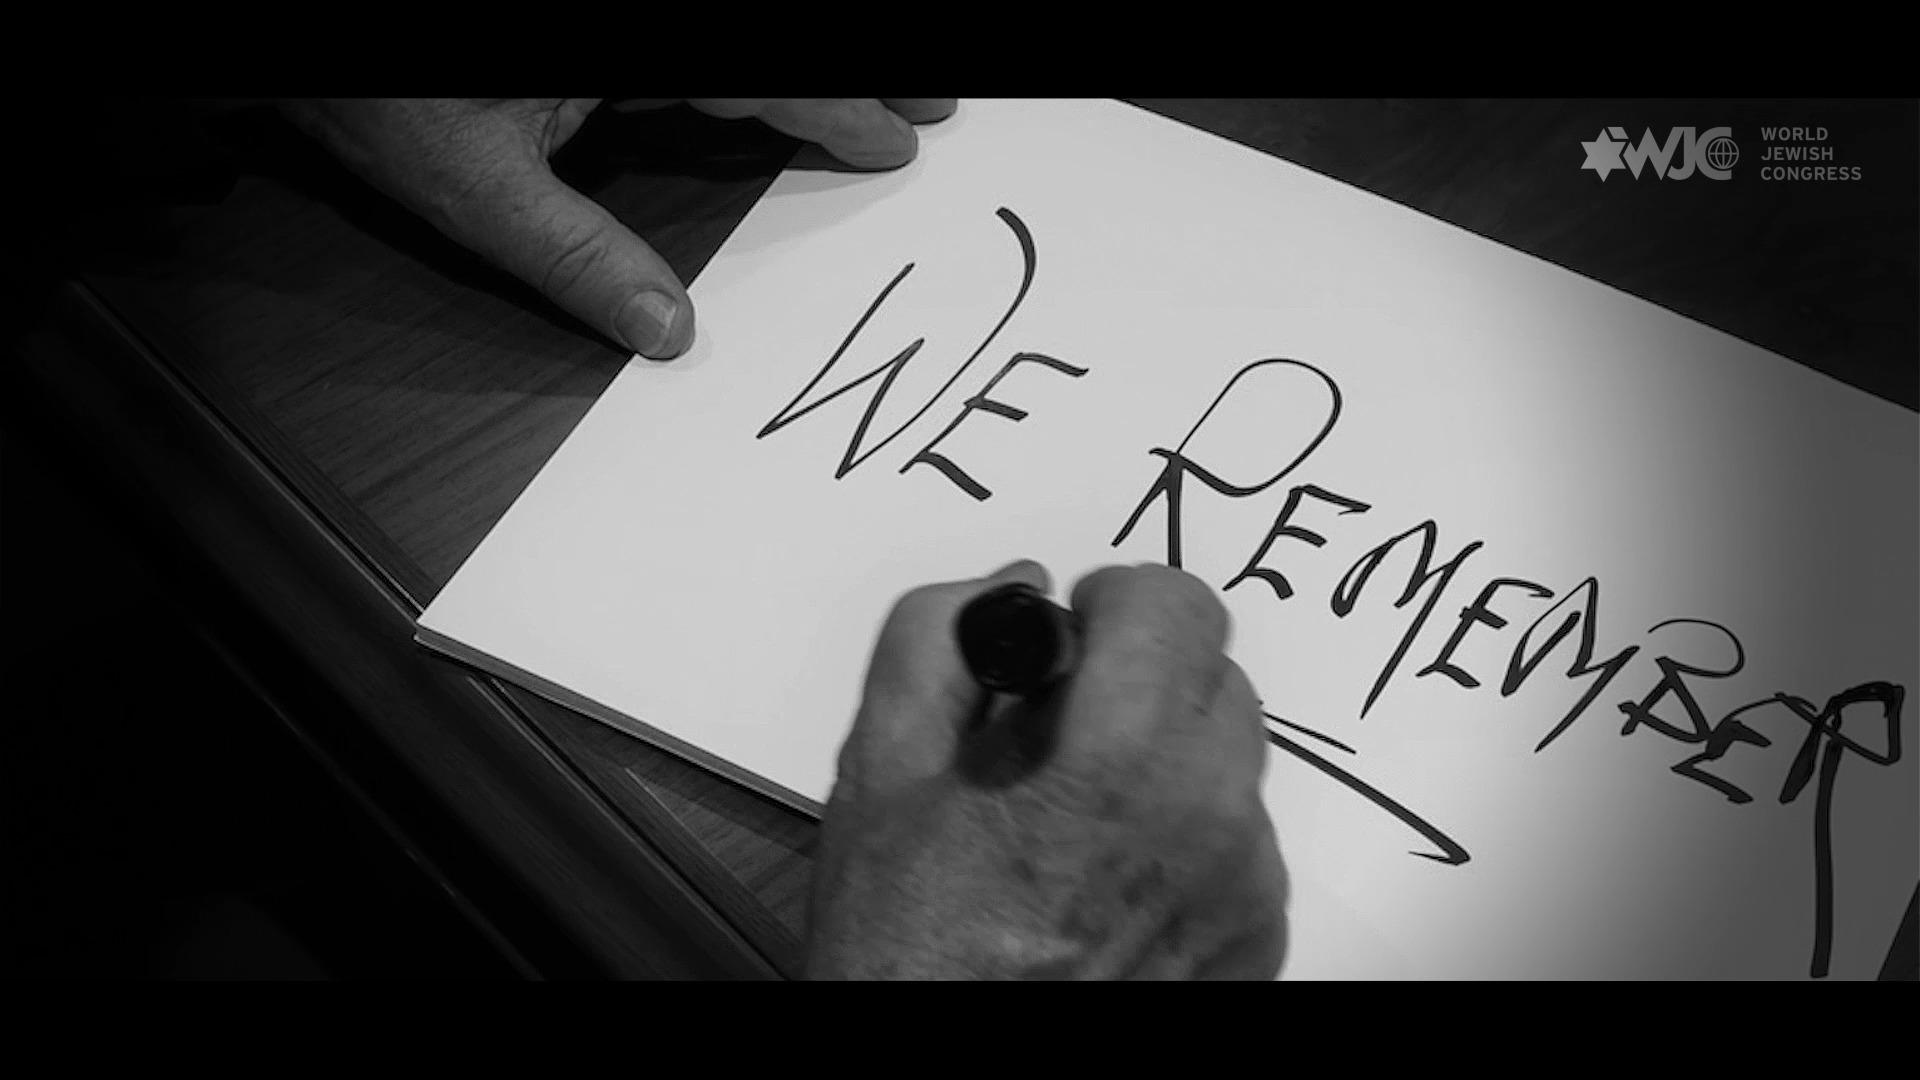 201224_weremember-youtube-1080p.jpg